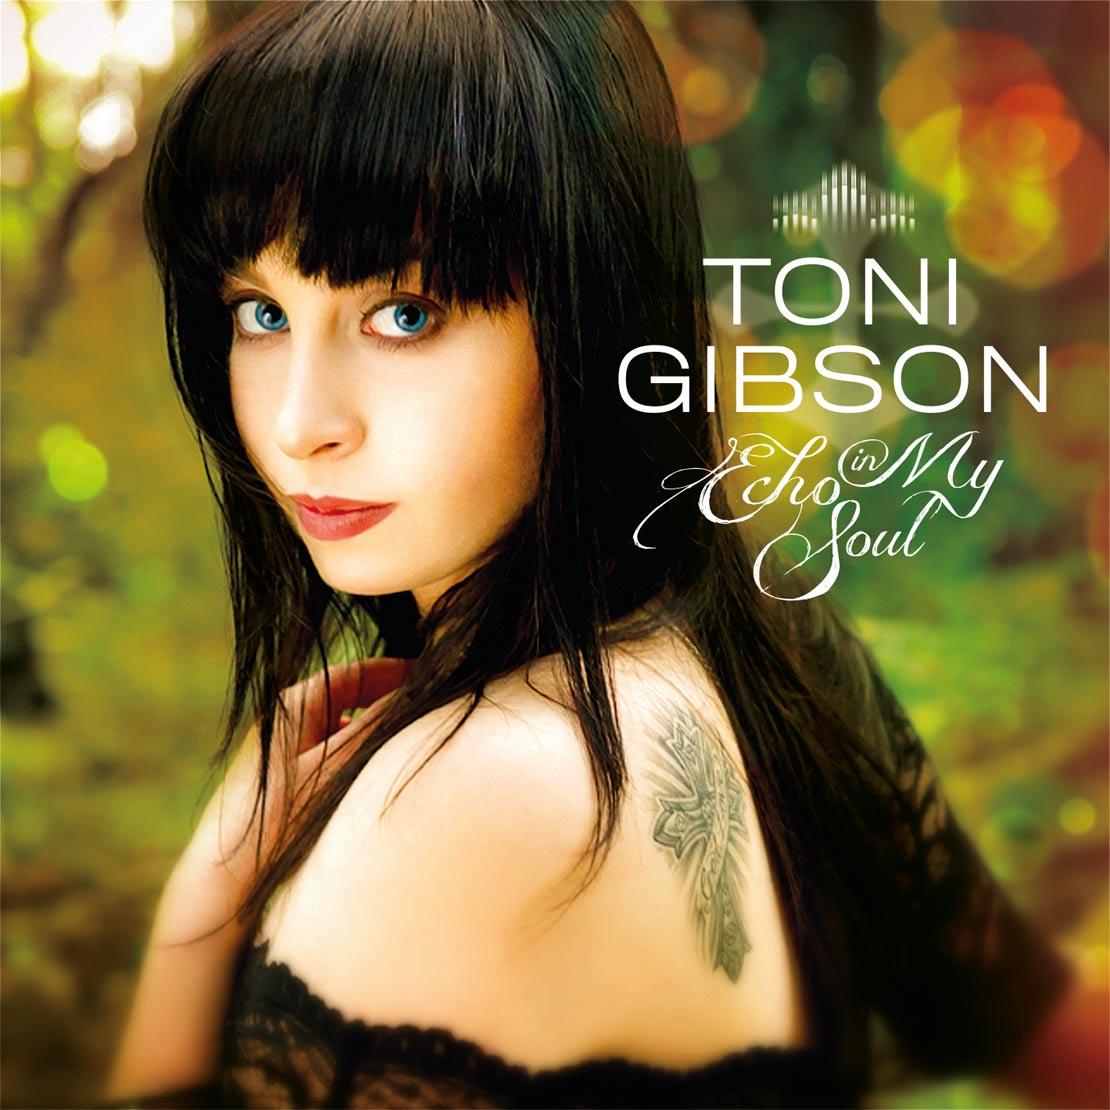 Toni Gibson 'Echo In My Soul'